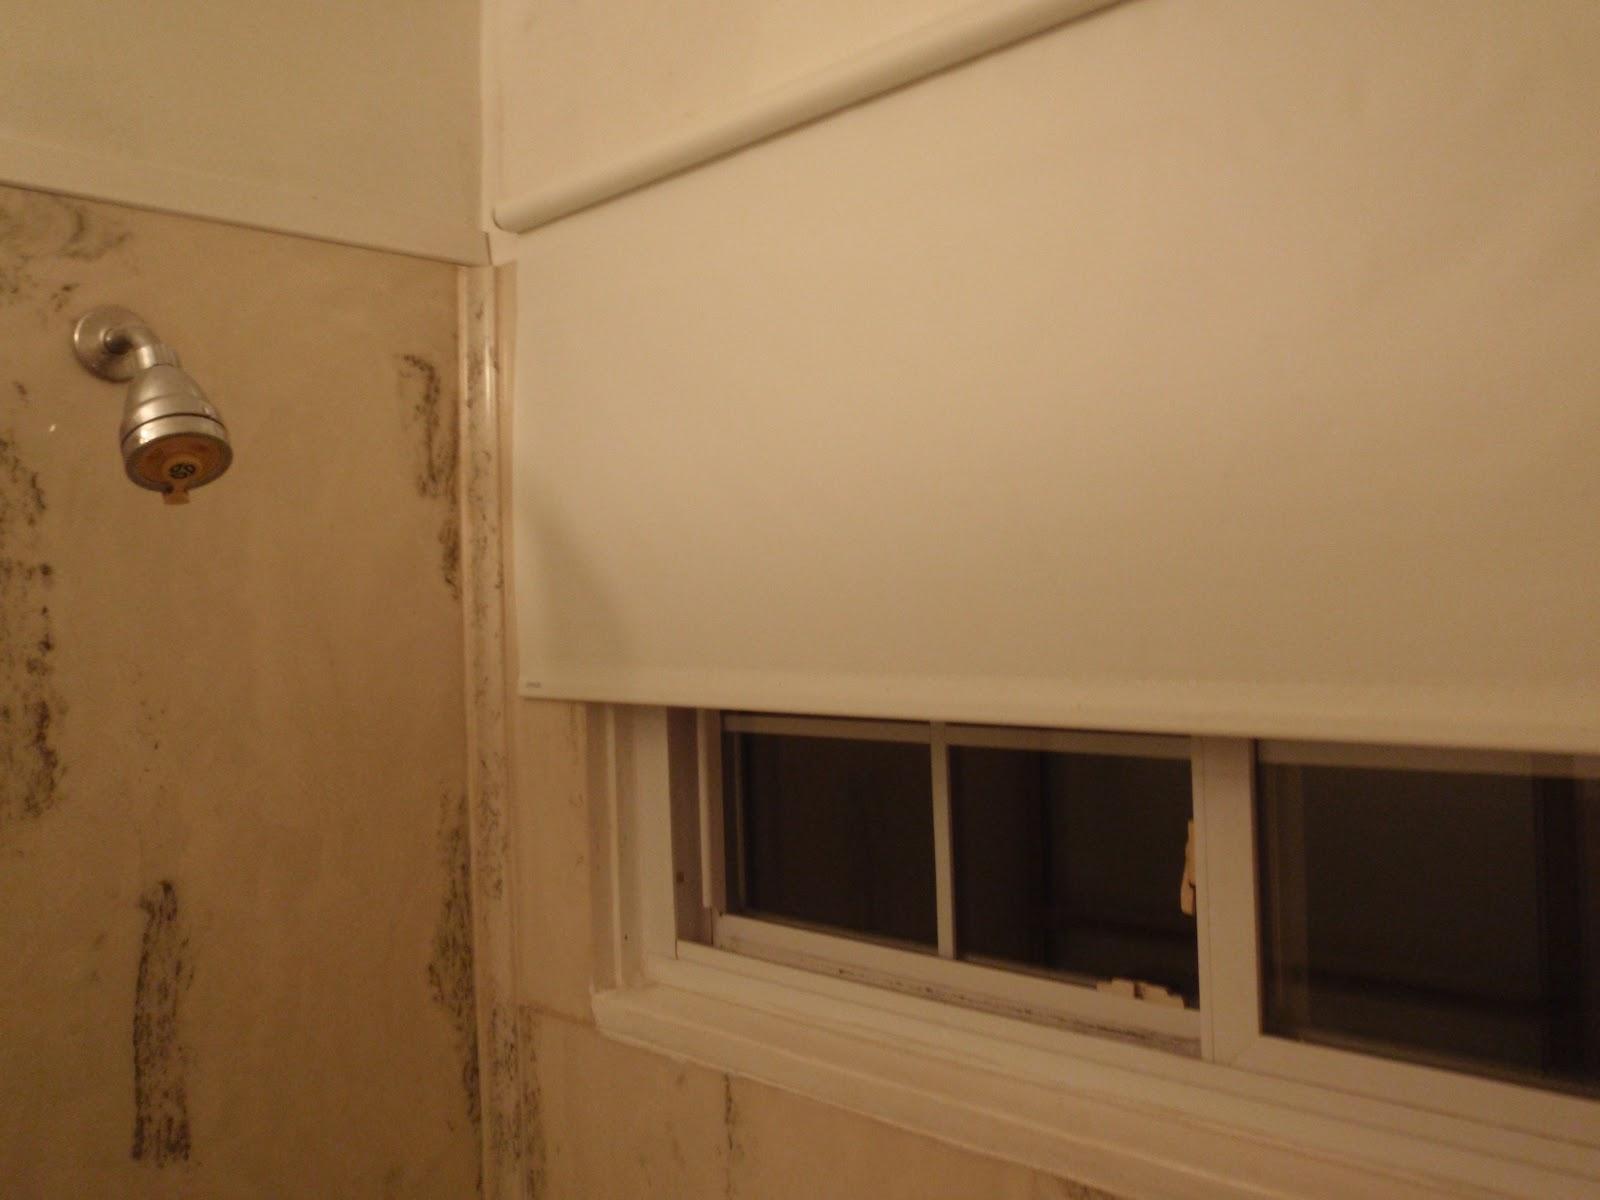 Bathroom Renovation Sequence Of Work : Bathroom remodel order images valrico member s